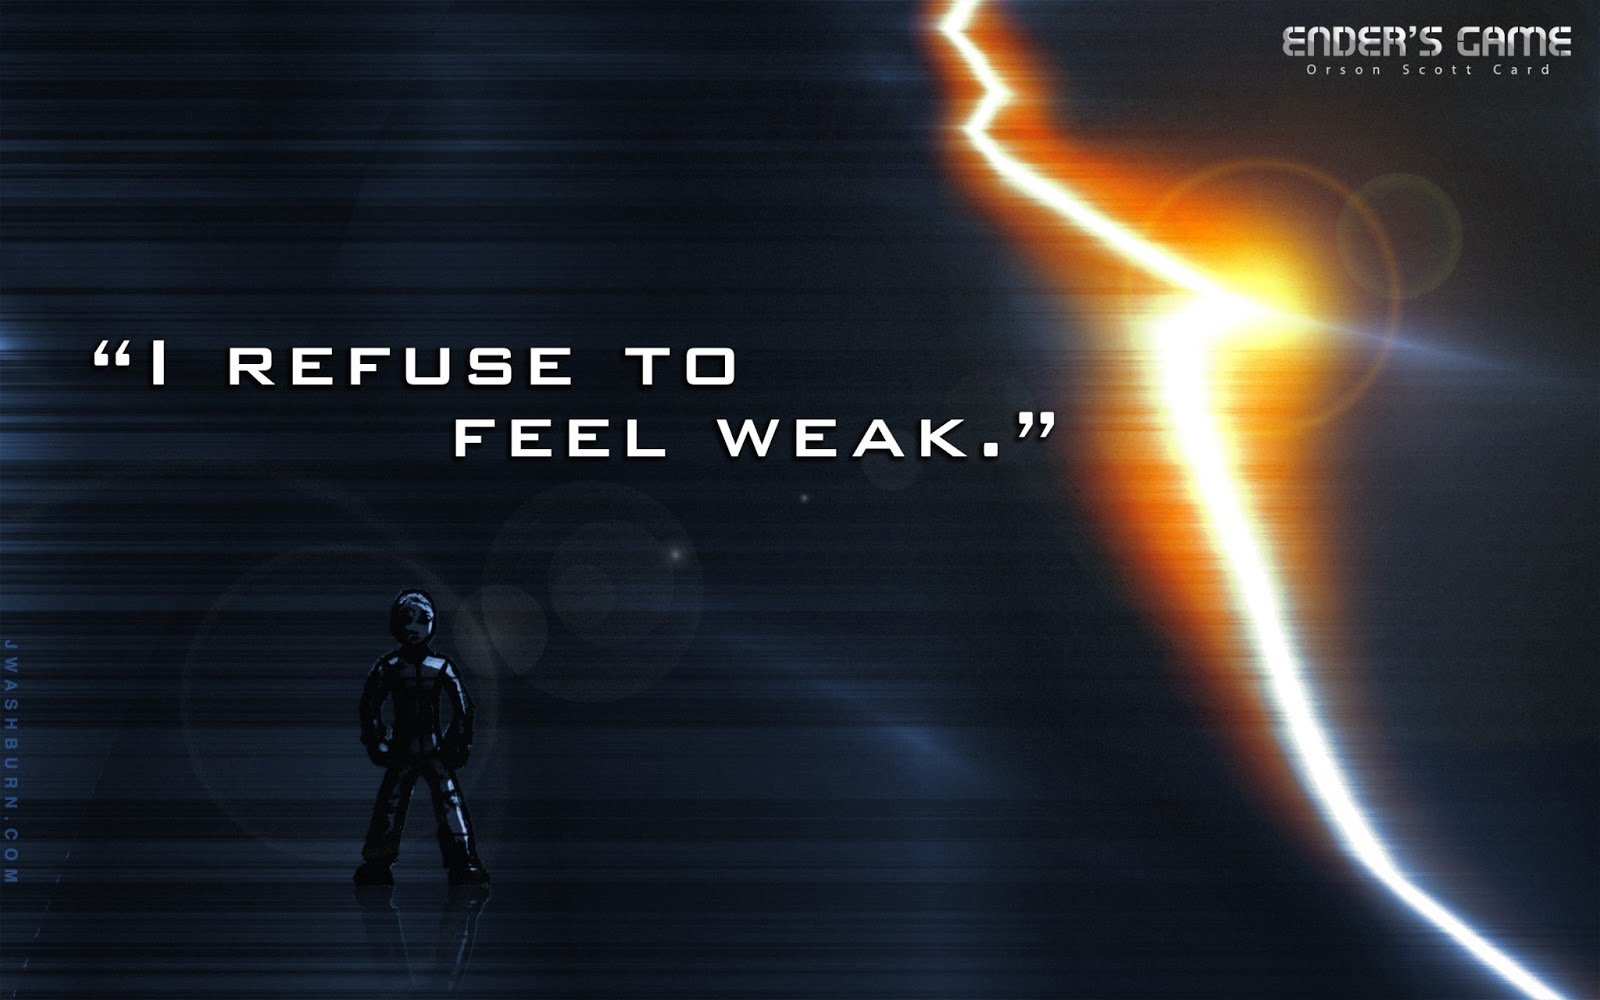 Enders Game Movie Quotes. QuotesGram